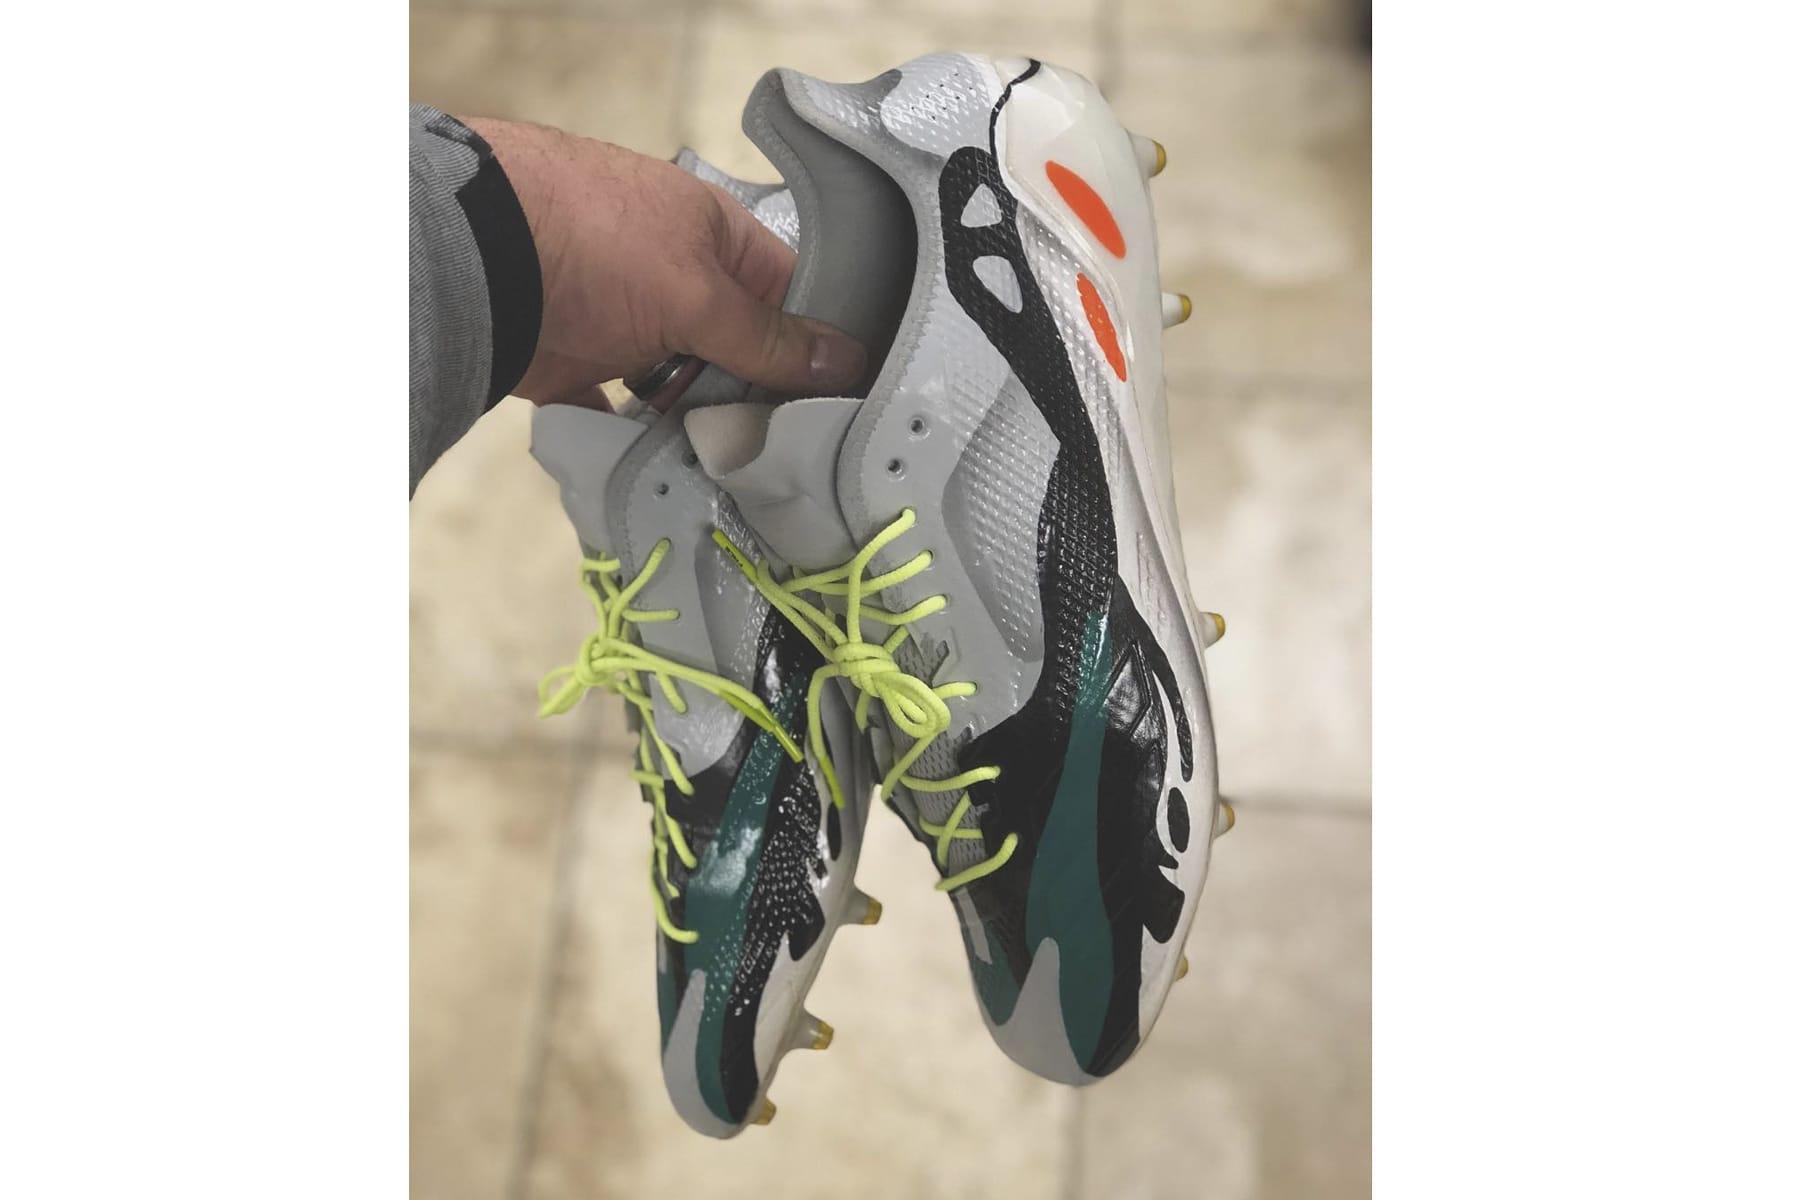 adidas YEEZY Wave Runner Custom Cleats